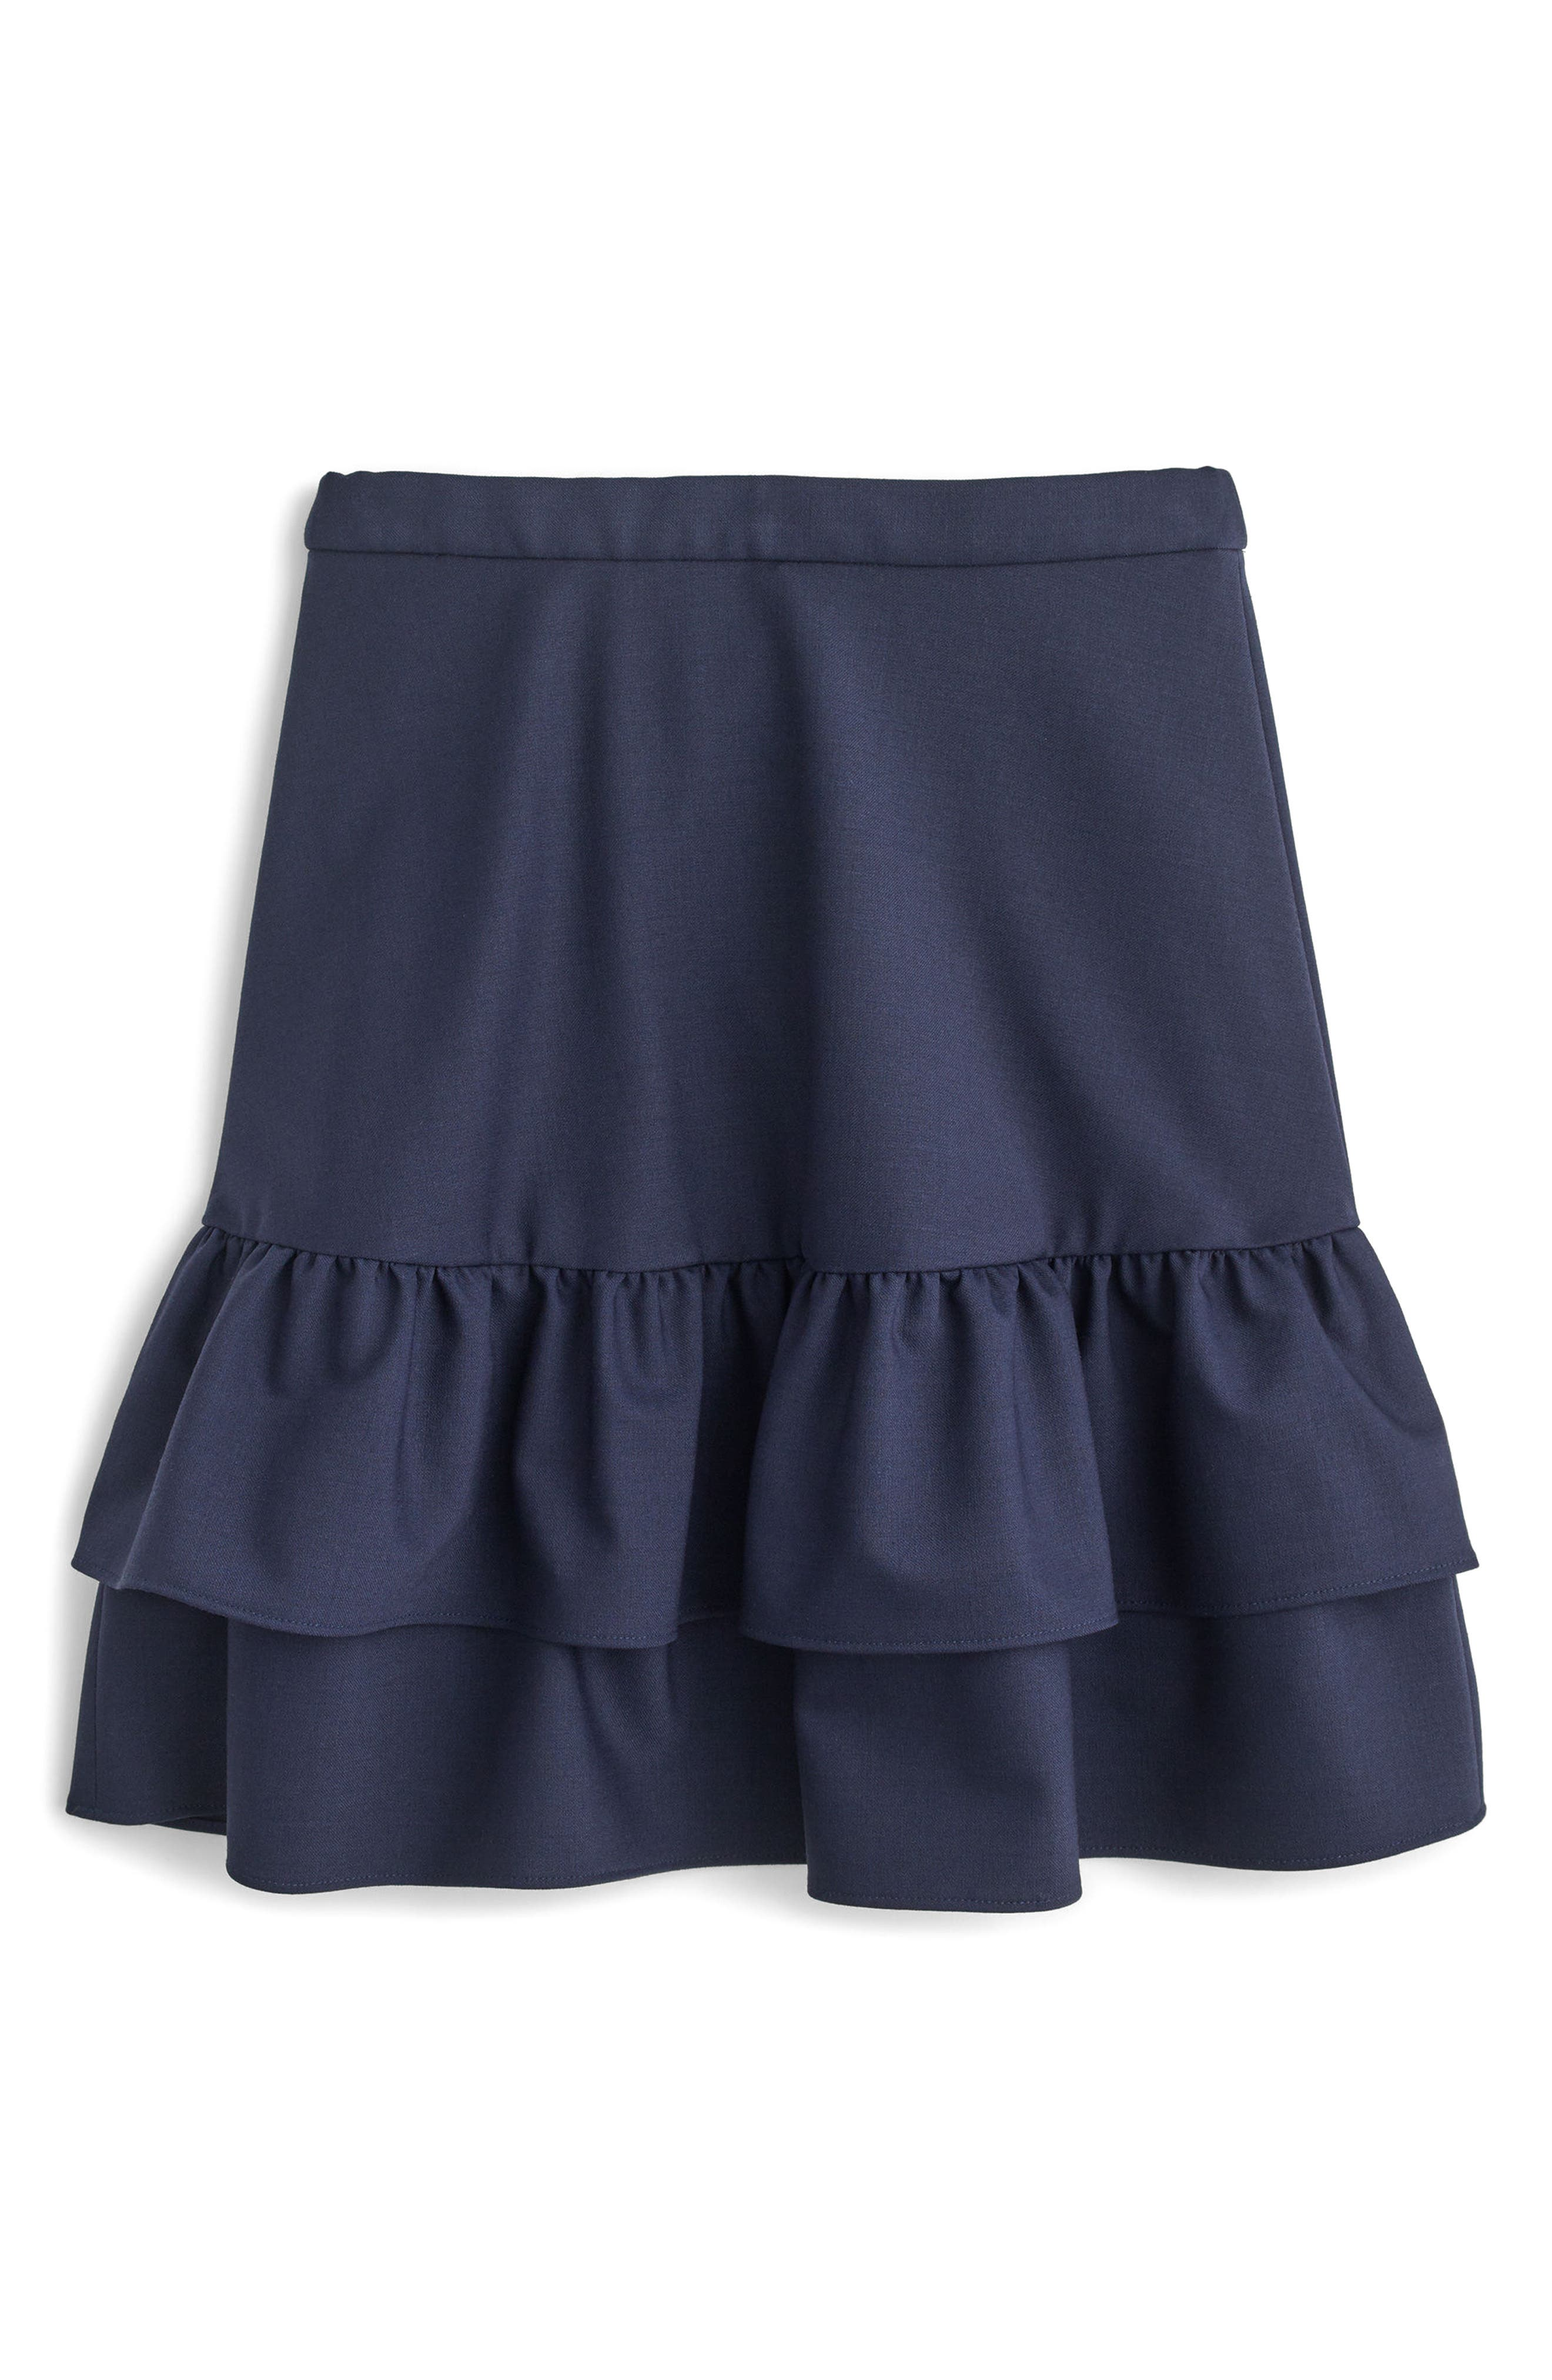 9534a572eb Skirts | Skirt Ify - Part 352